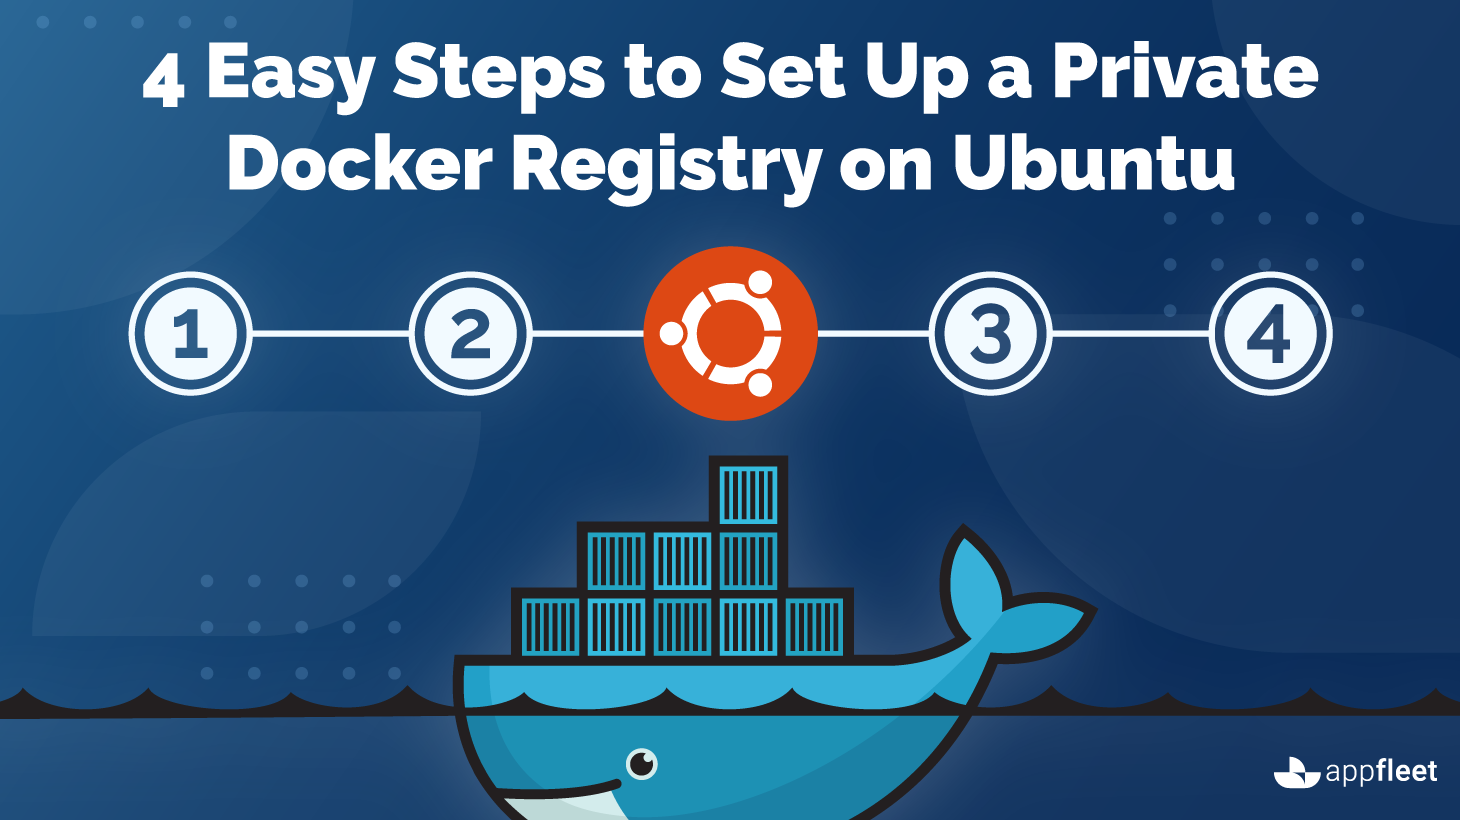 4 Easy Steps to Set Up a Private Docker Registry on Ubuntu